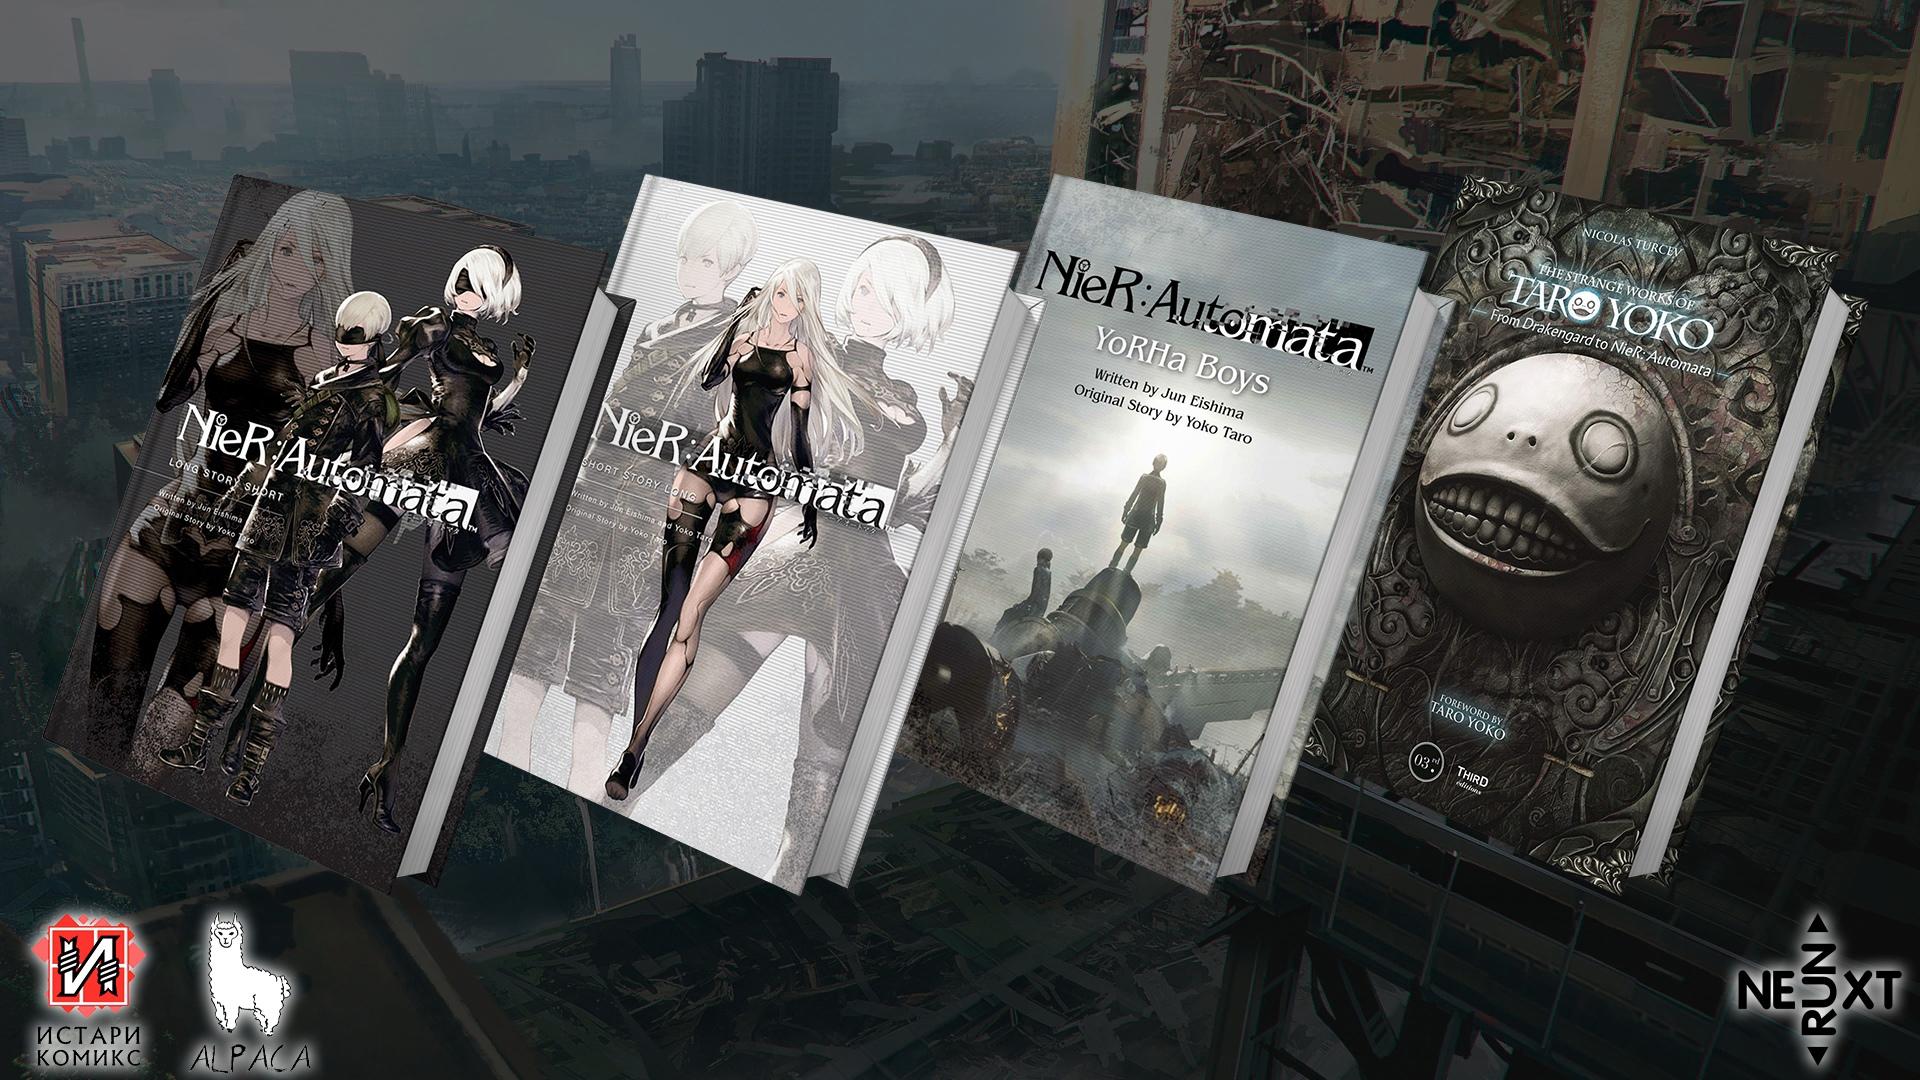 «Истари Комикс» выпустит книгу о творчестве Ёко Таро и три романа по NieR 1